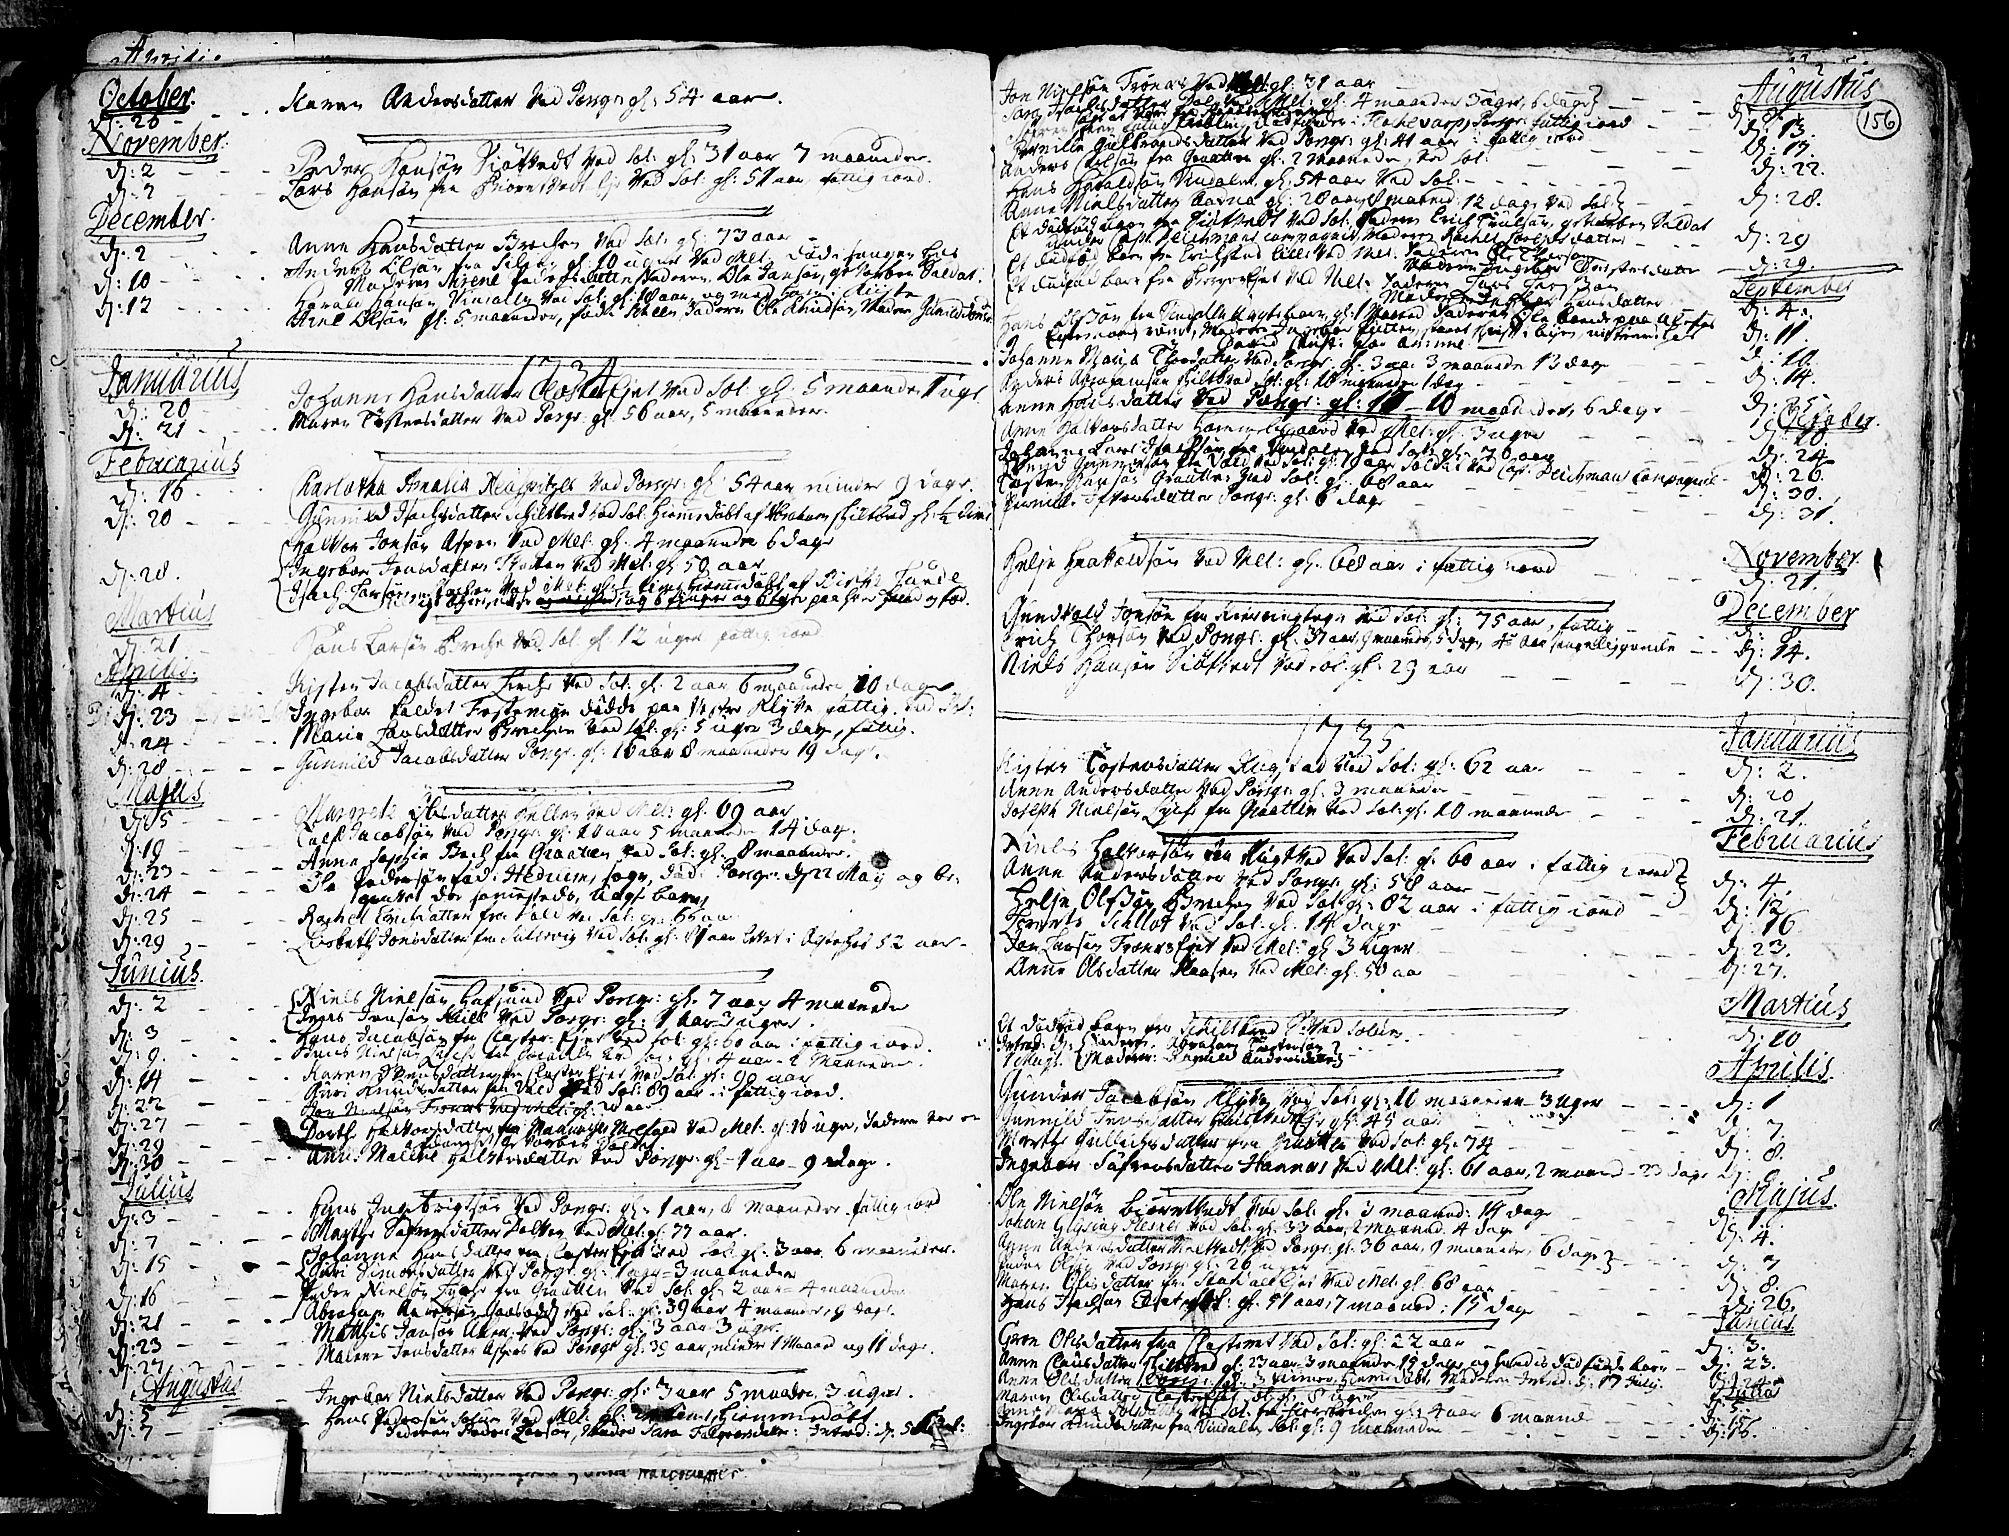 SAKO, Solum kirkebøker, F/Fa/L0002: Ministerialbok nr. I 2, 1713-1761, s. 156